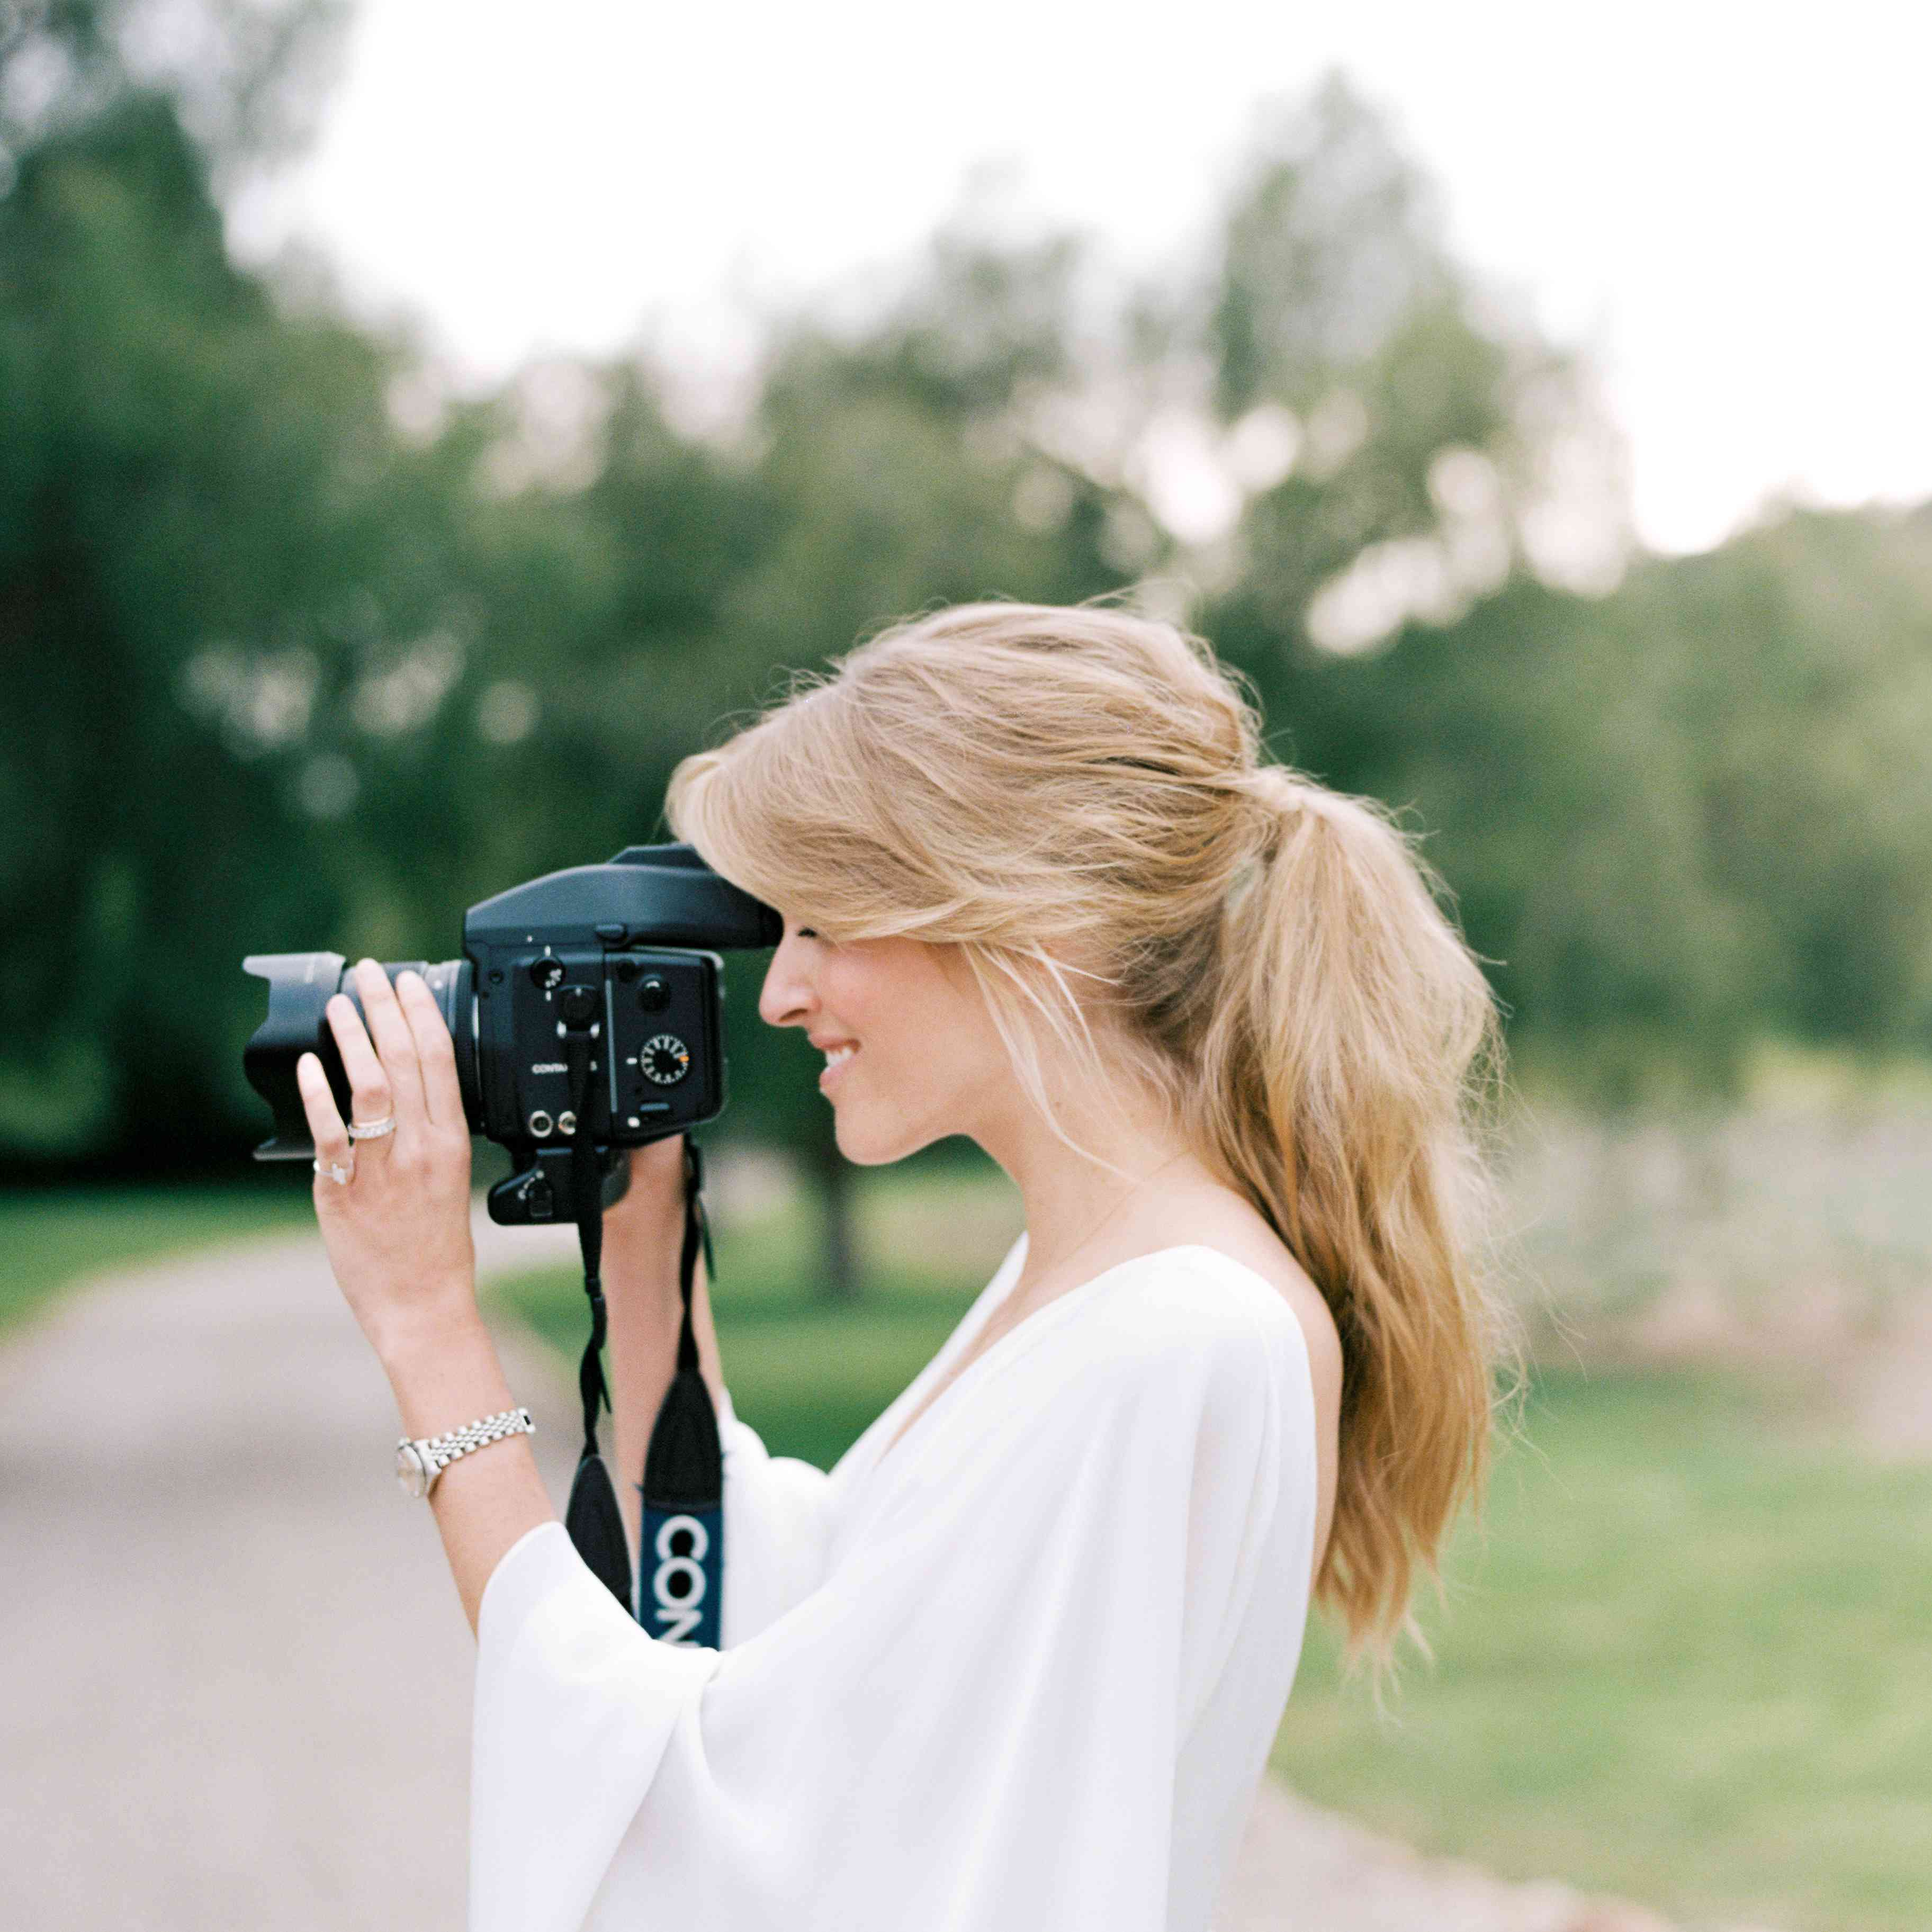 bride taking photos with camera